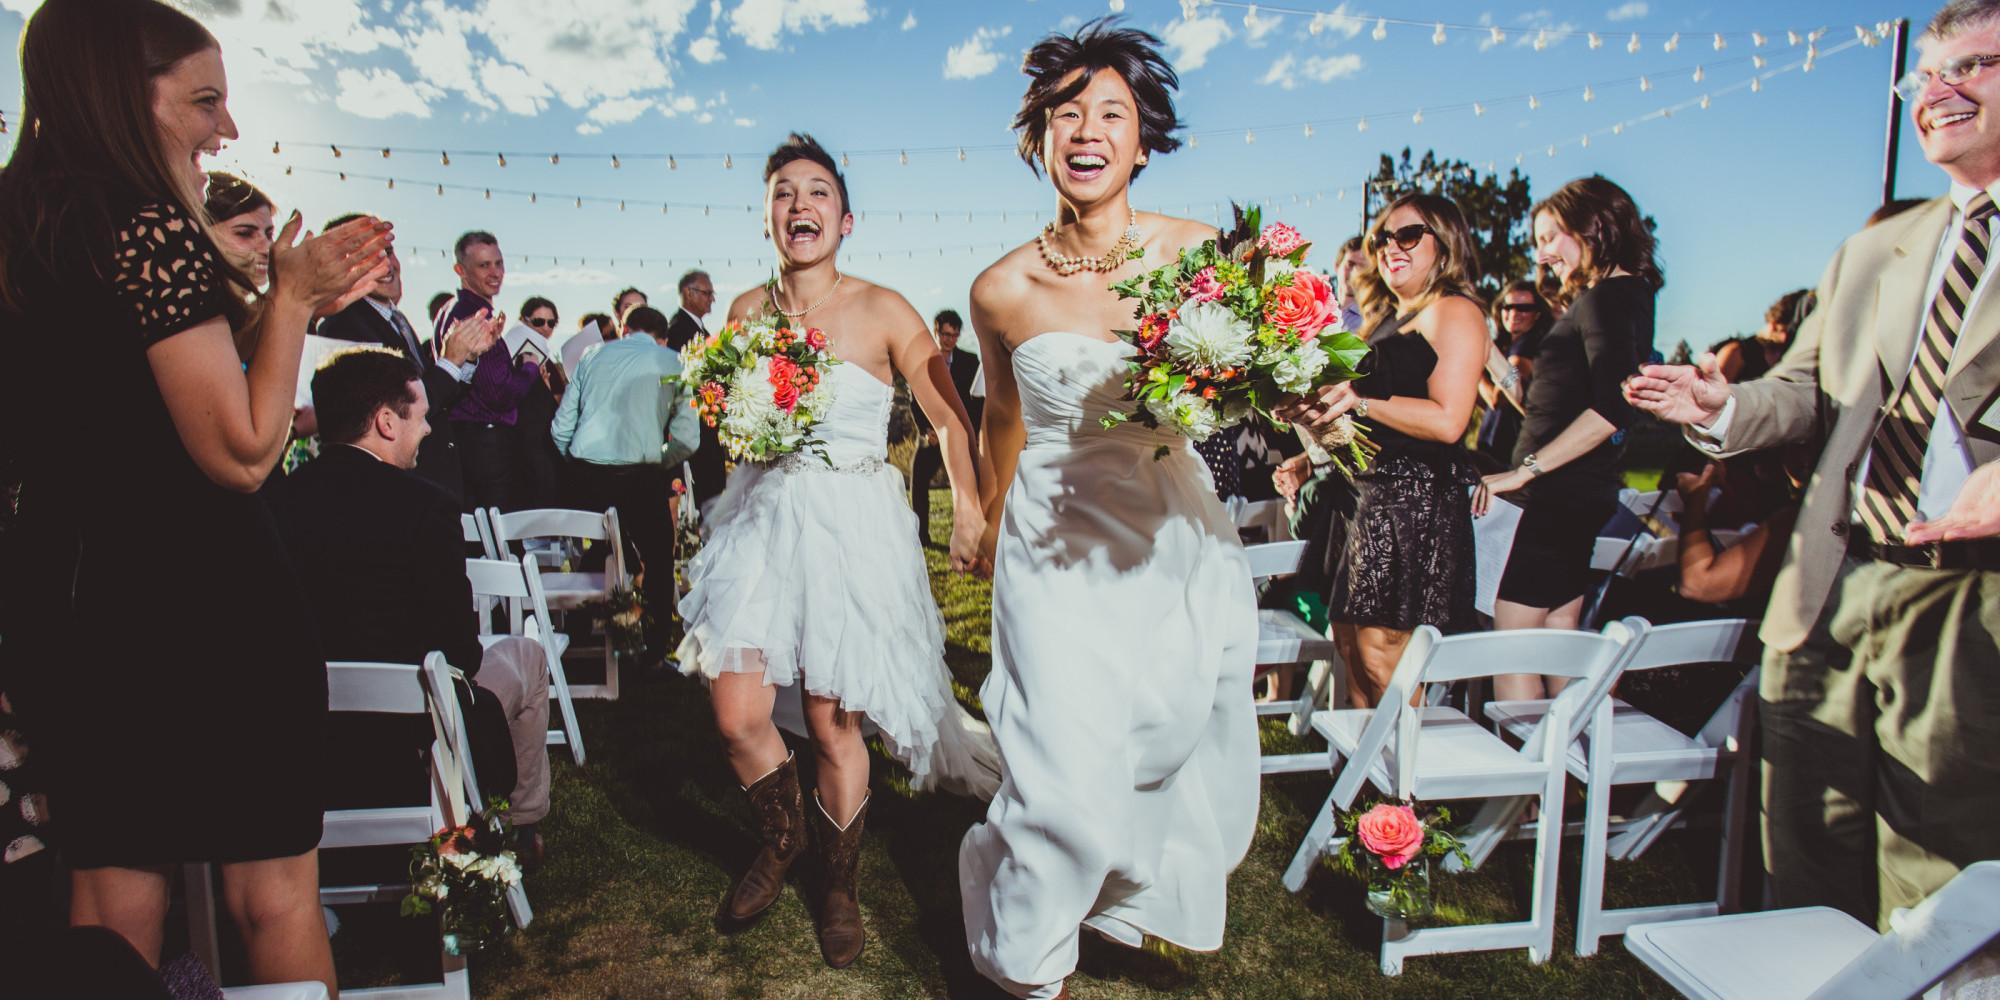 Massive gay wedding